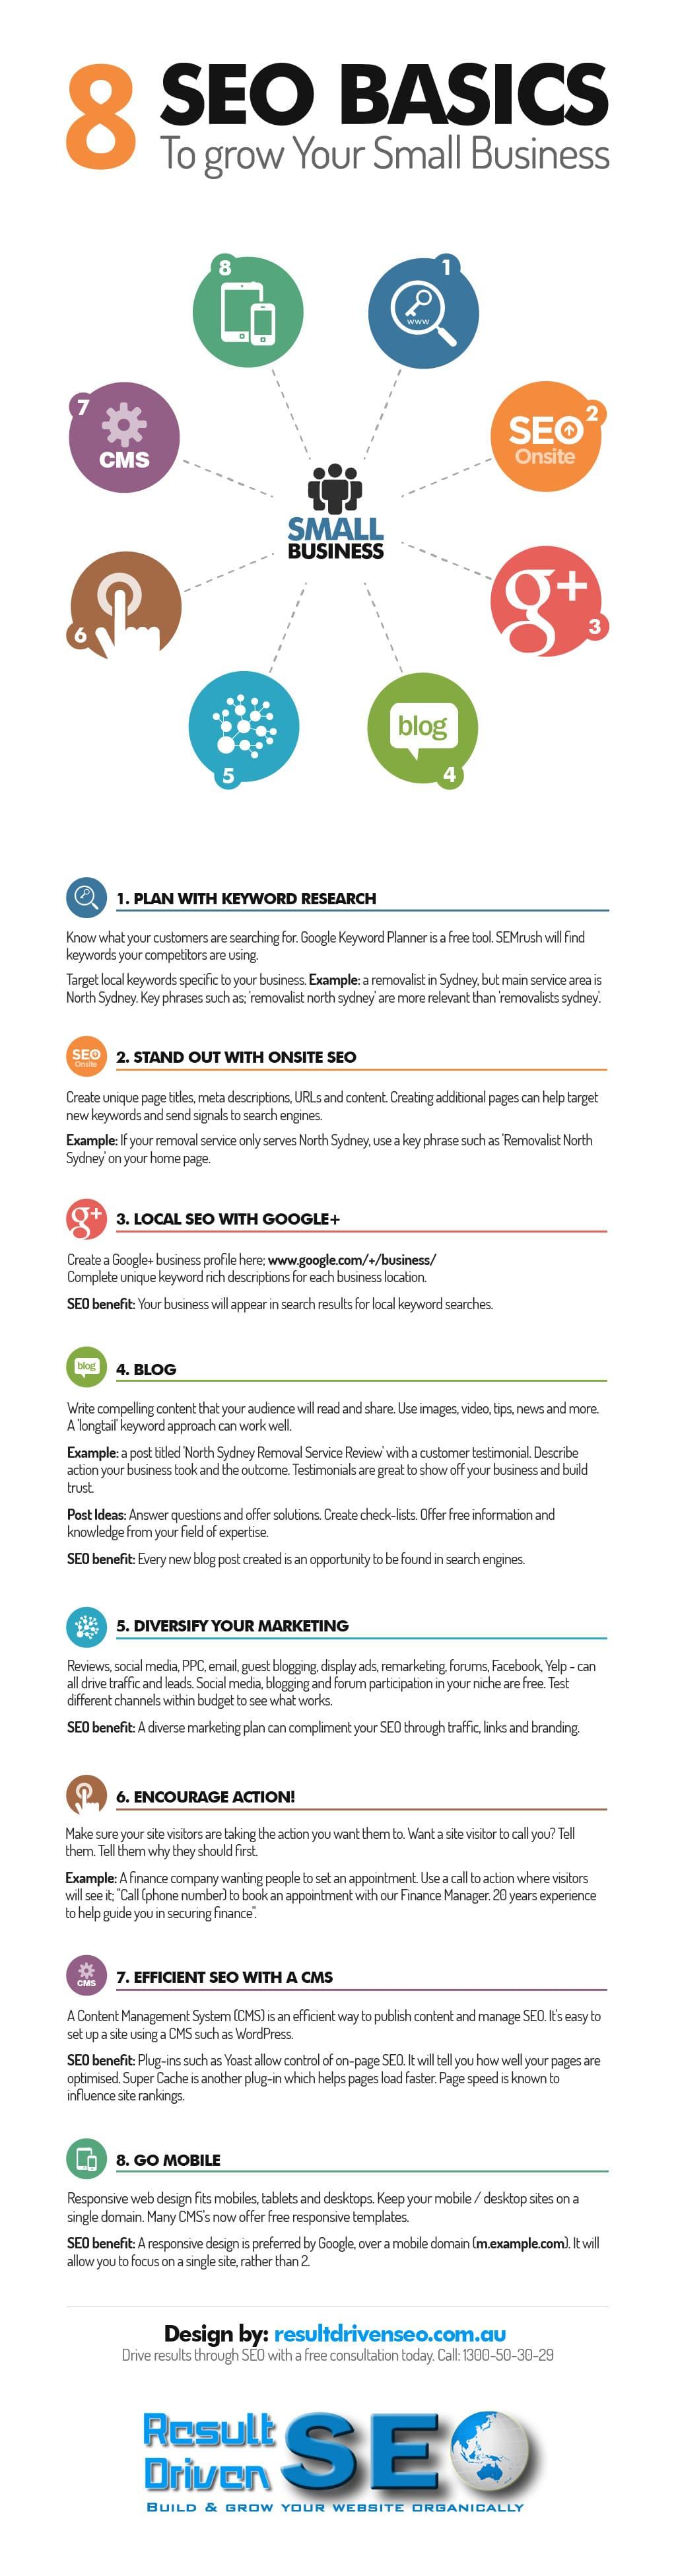 8 SEO Basics Infographic